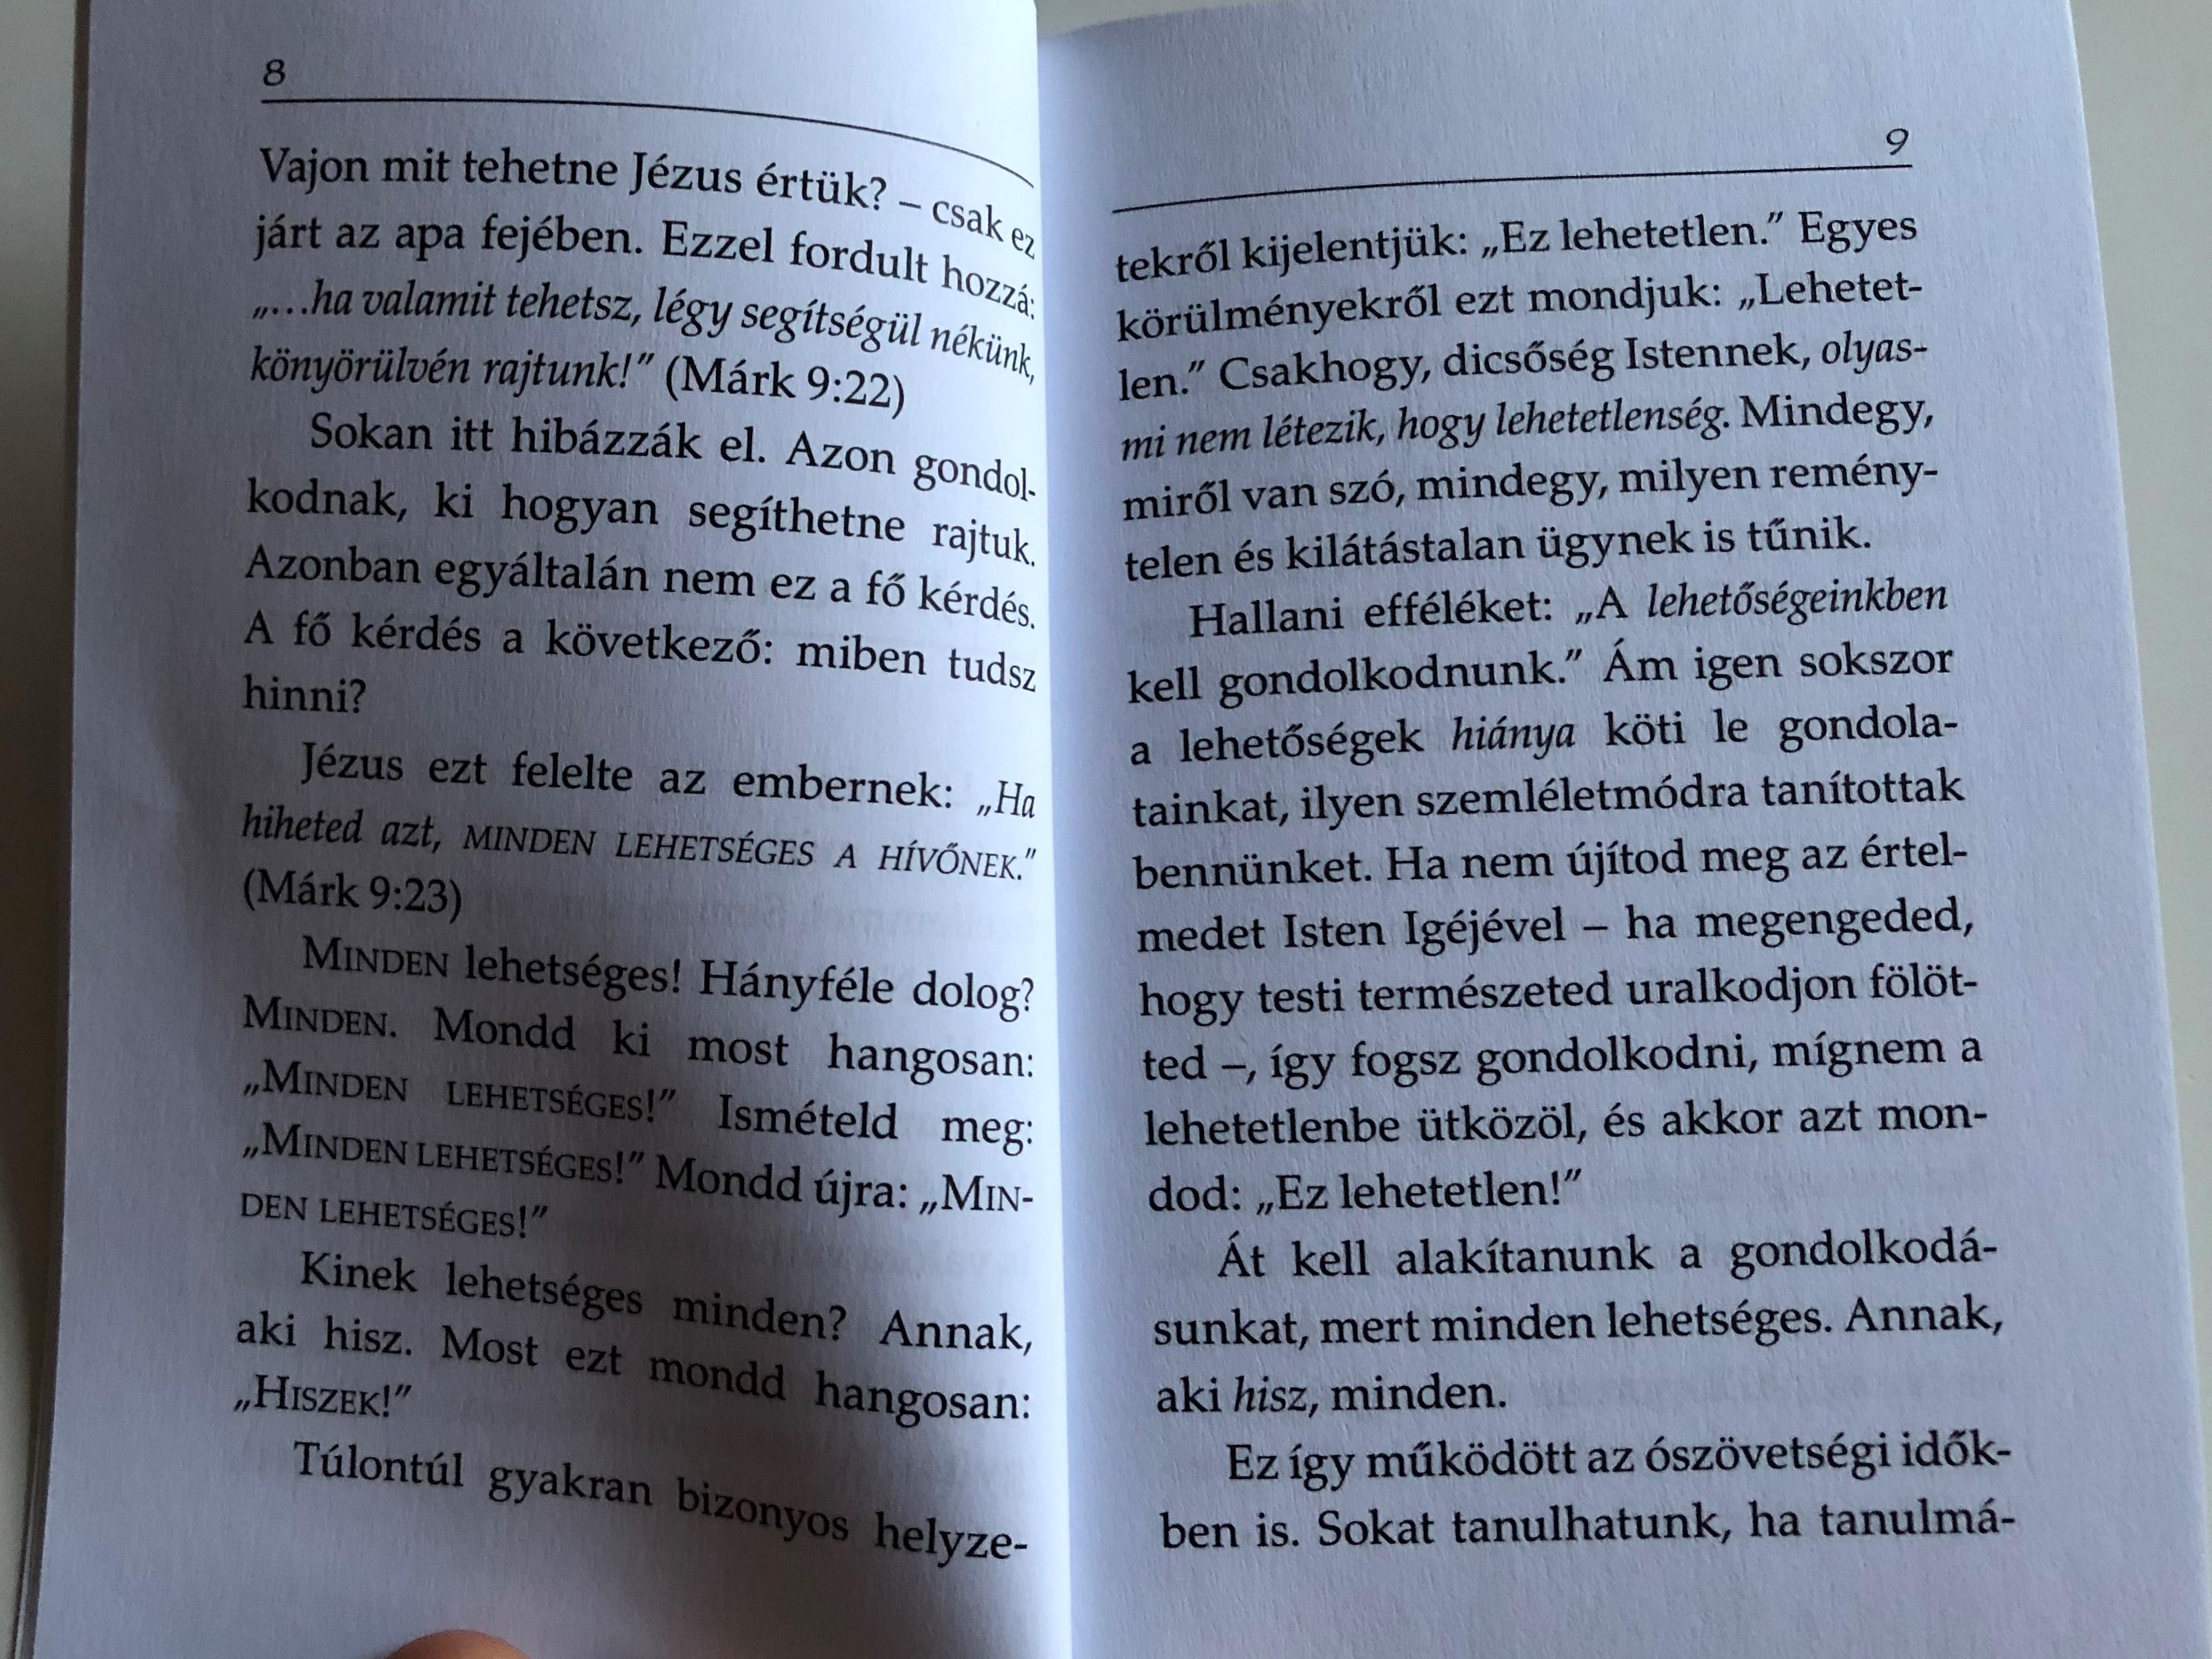 -hogyan-ford-ts-rem-nytelen-helyzeteden-by-kenneth-e.-hagin-hungarian-edition-of-turning-hopeless-situation-around-4-.jpg